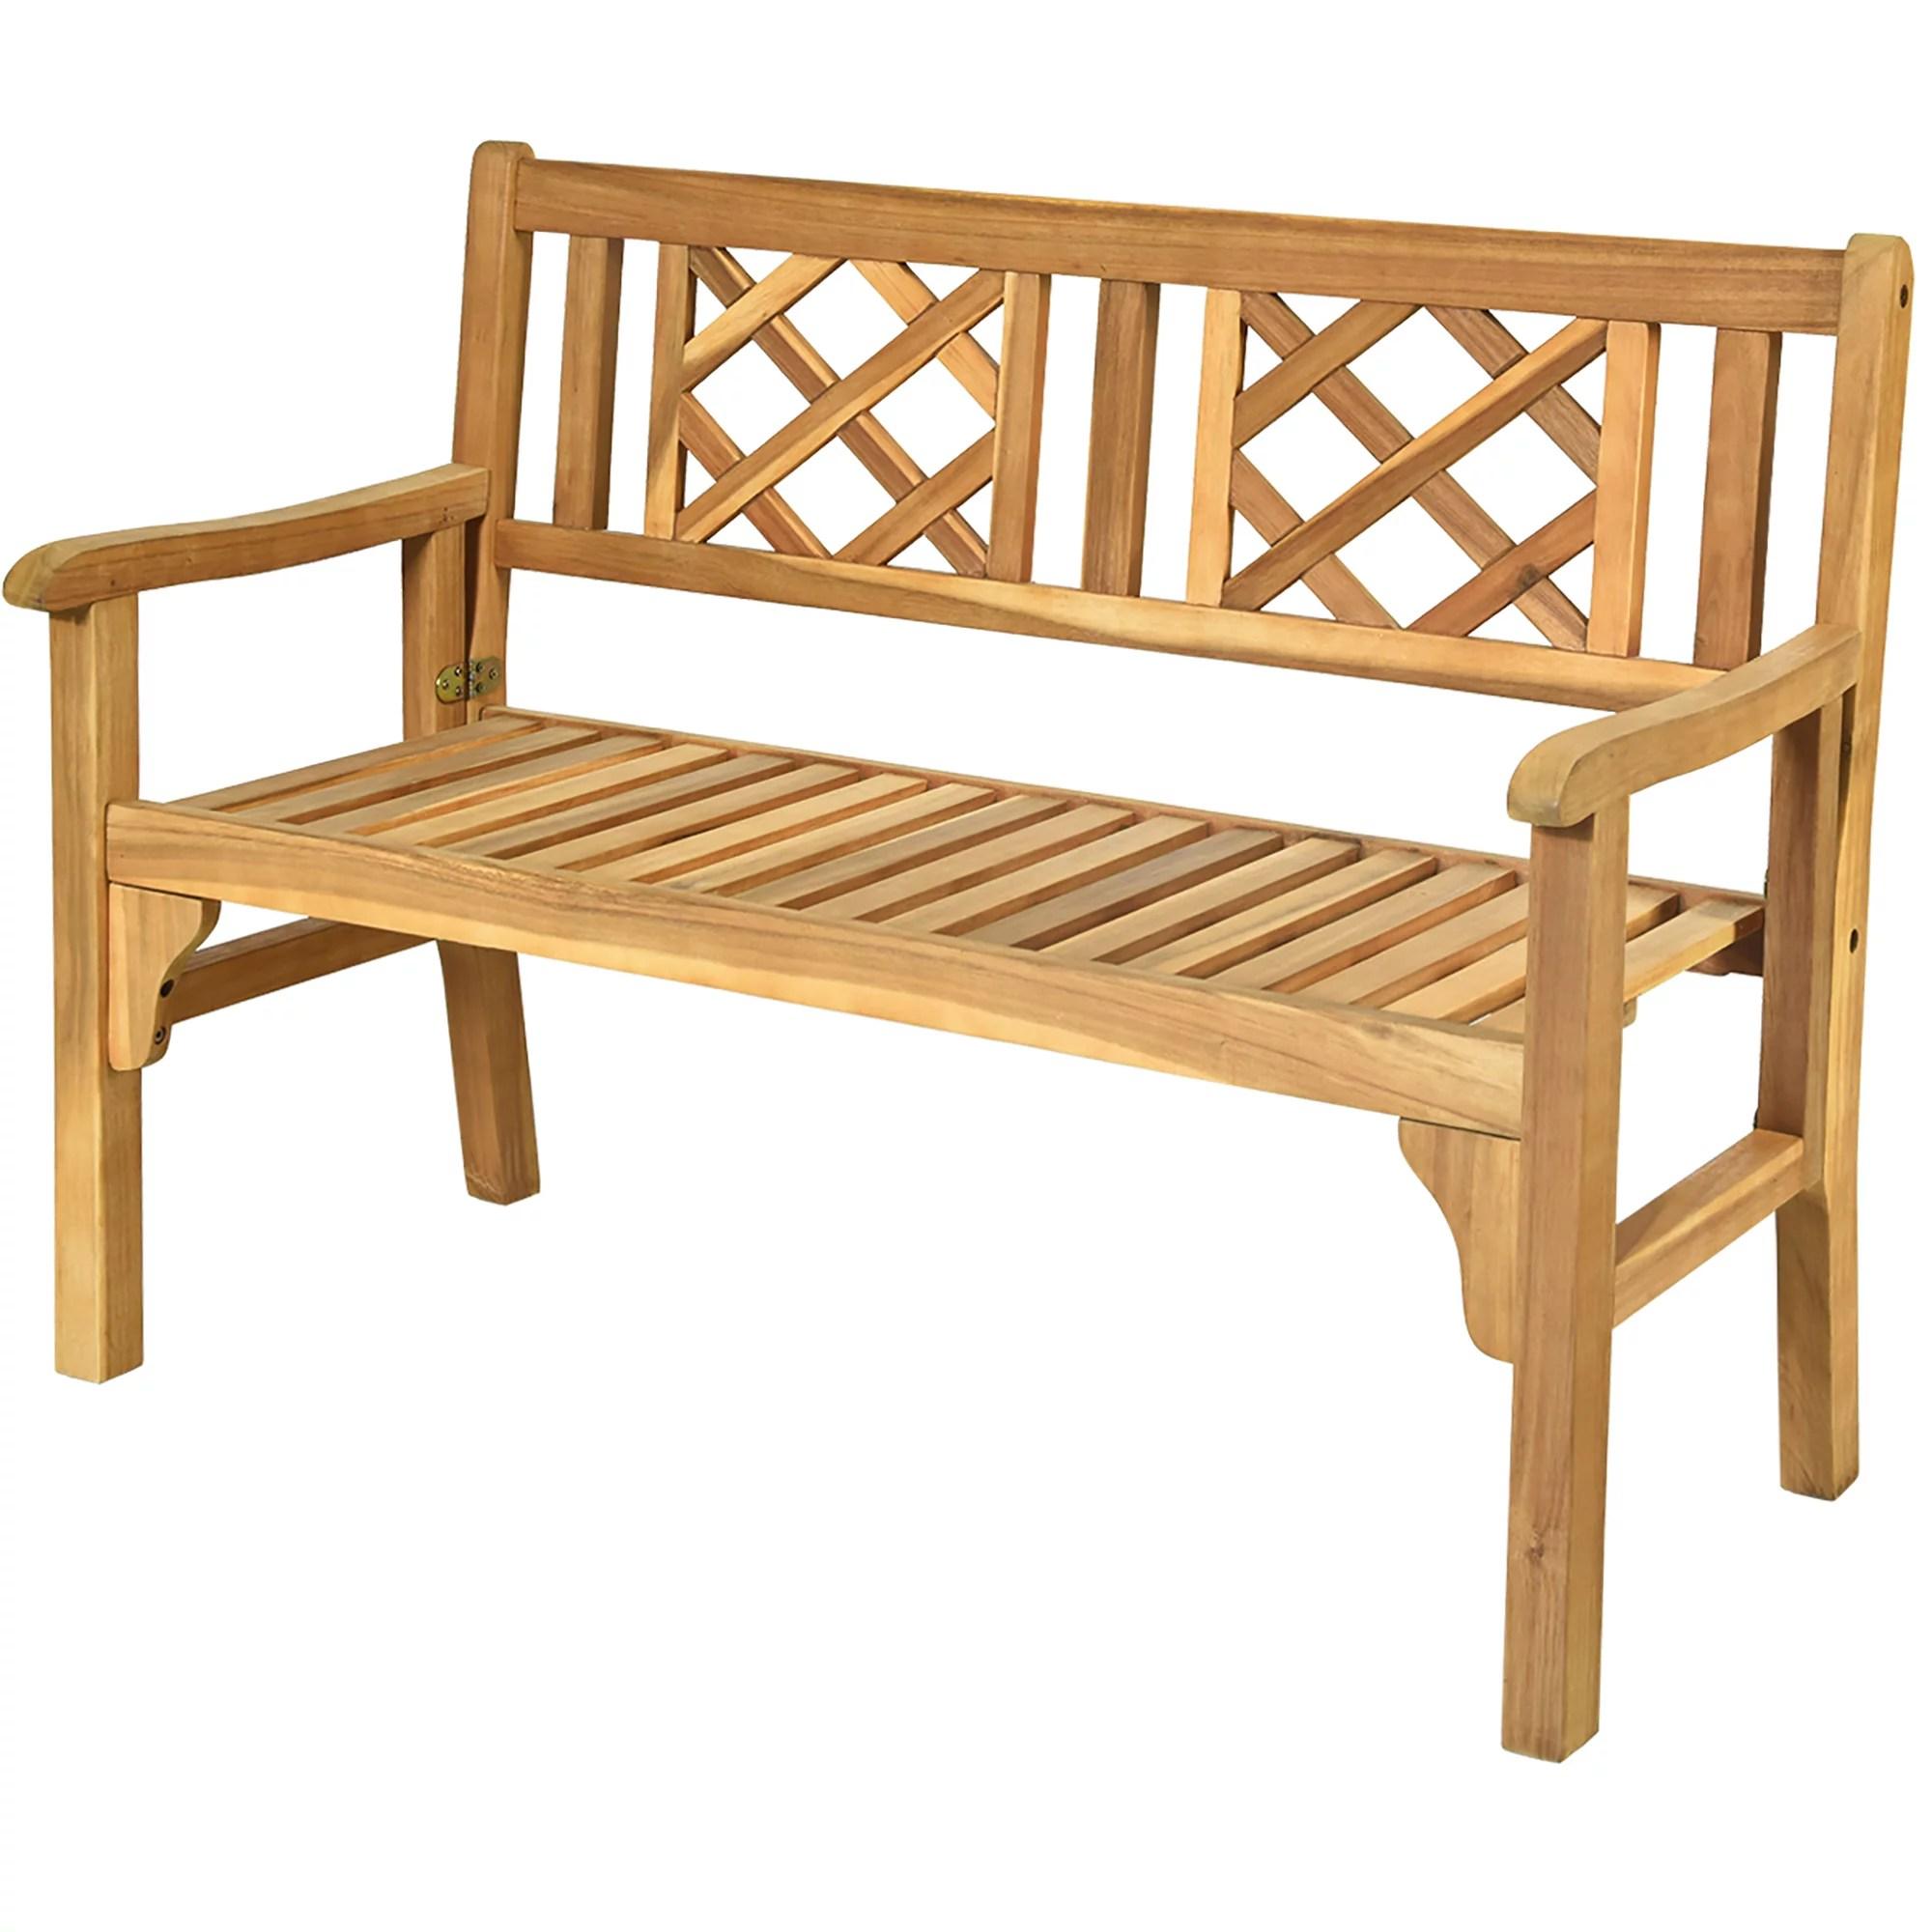 costway patio outdoor solid wood bench folding loveseat chair park garden deck furniture